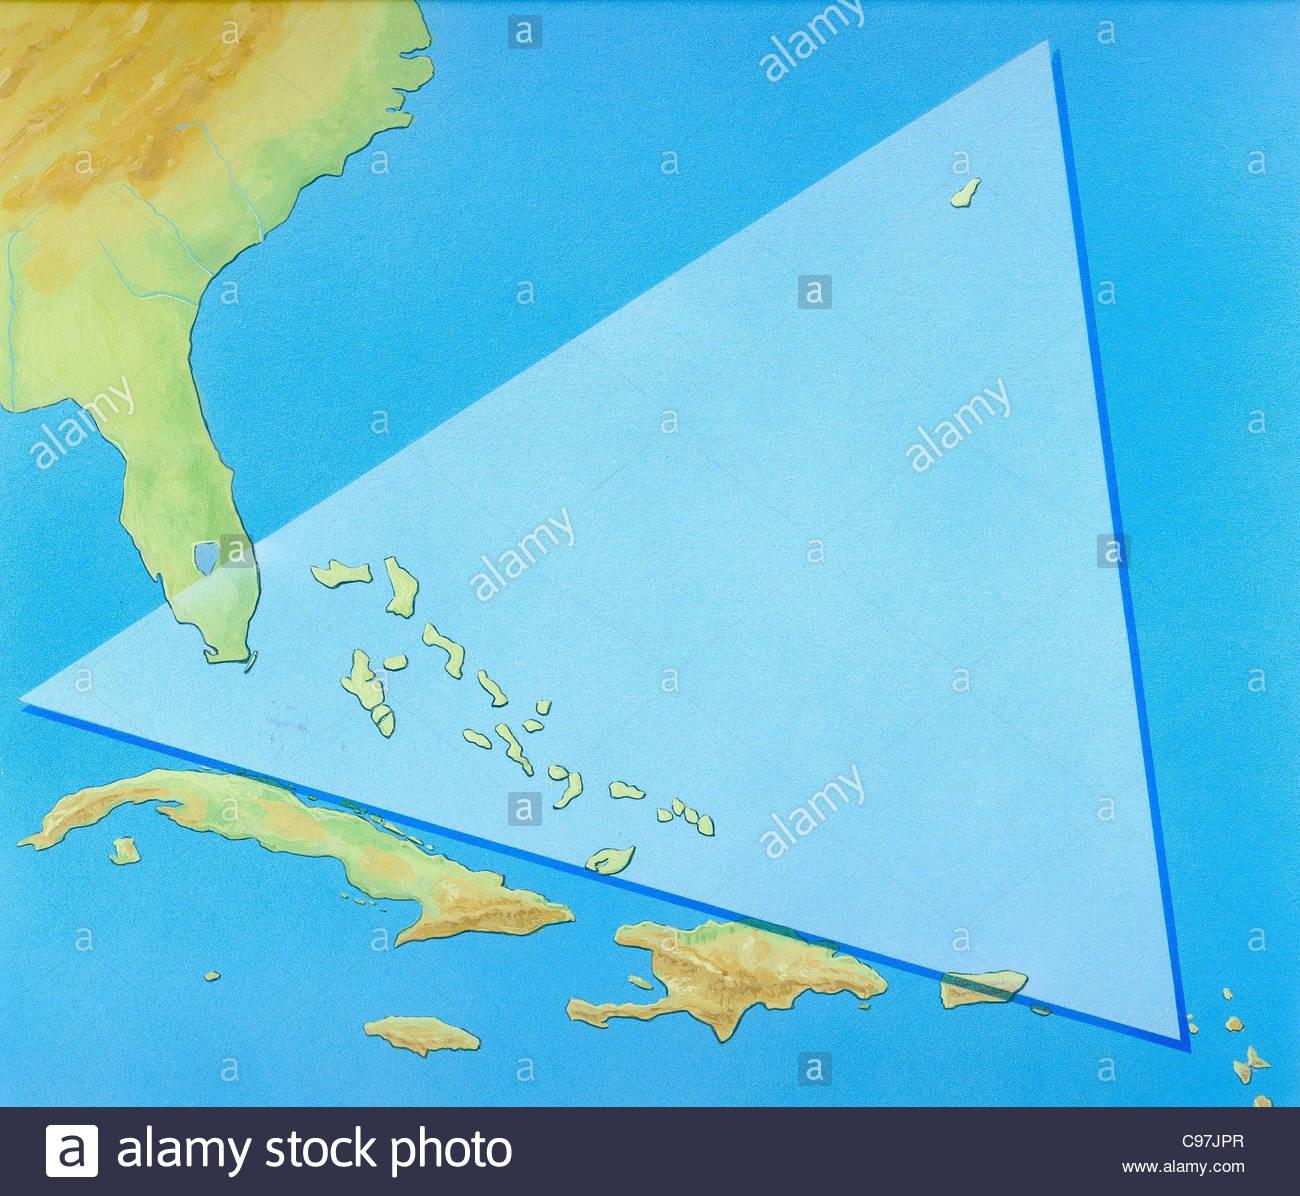 Bermuda Triangle Shipwrecks Map